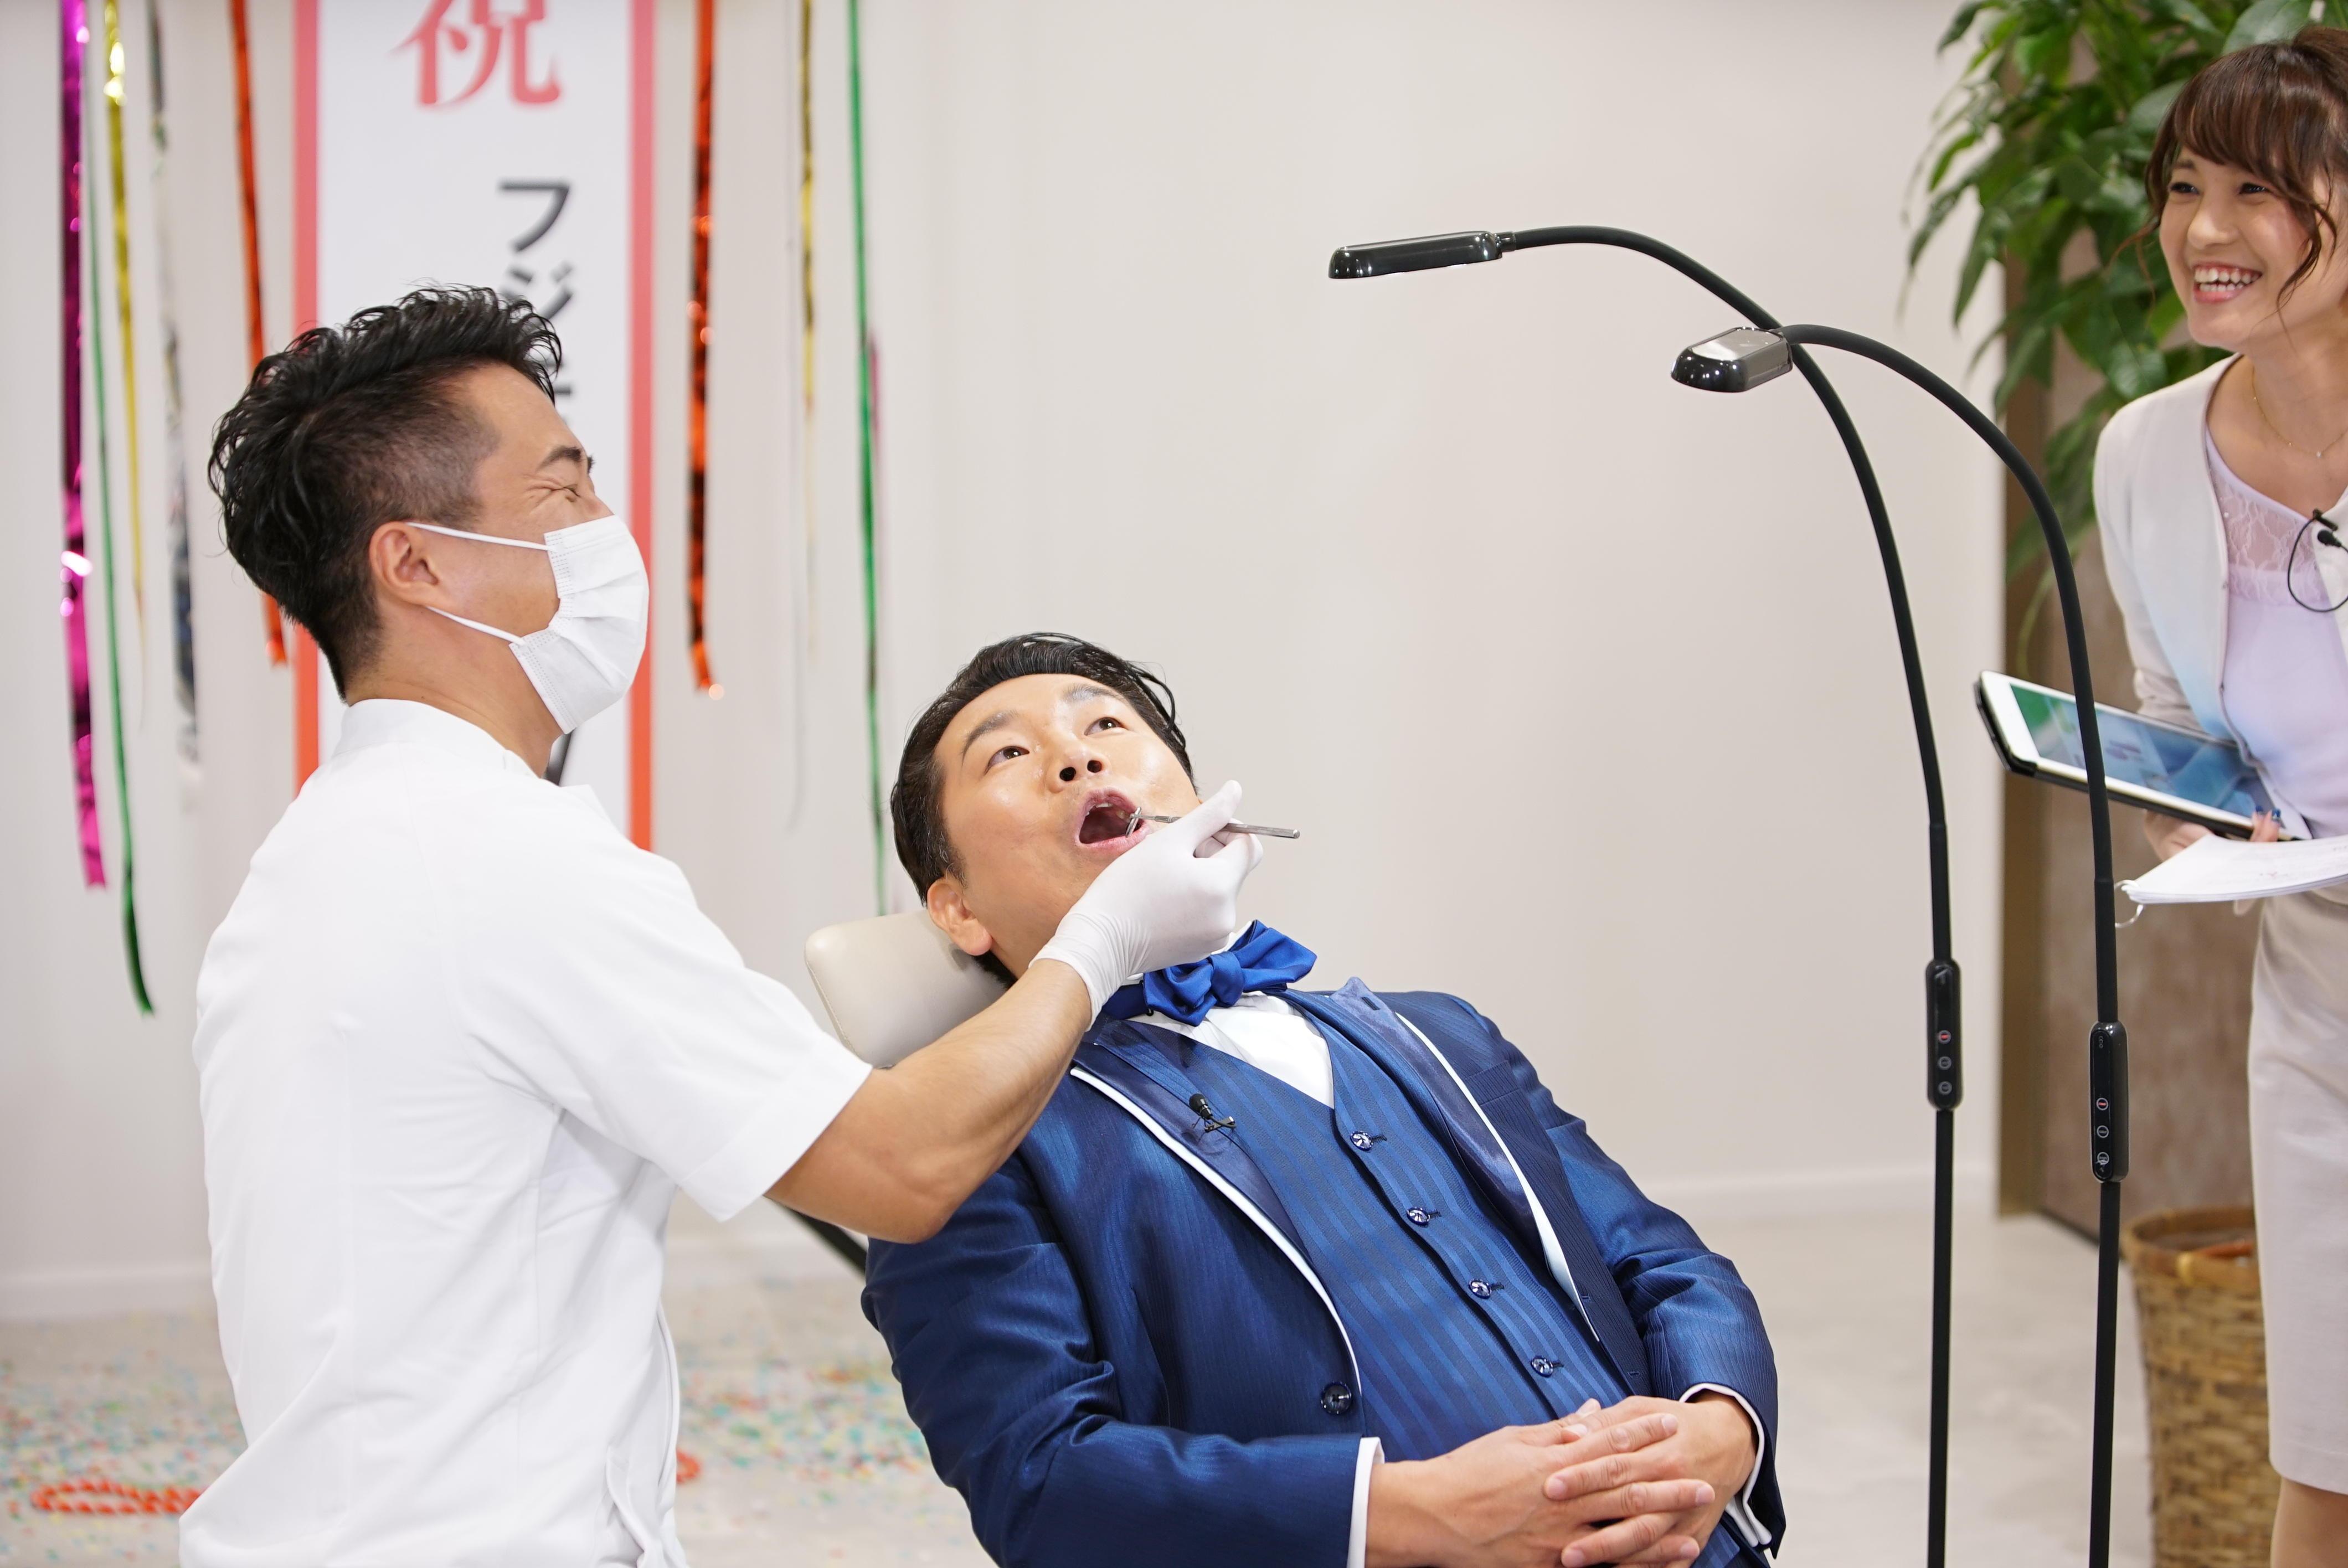 http://news.yoshimoto.co.jp/20180712103856-207562f80ed569b4b6d75cc7b377aebea5fadae0.jpg